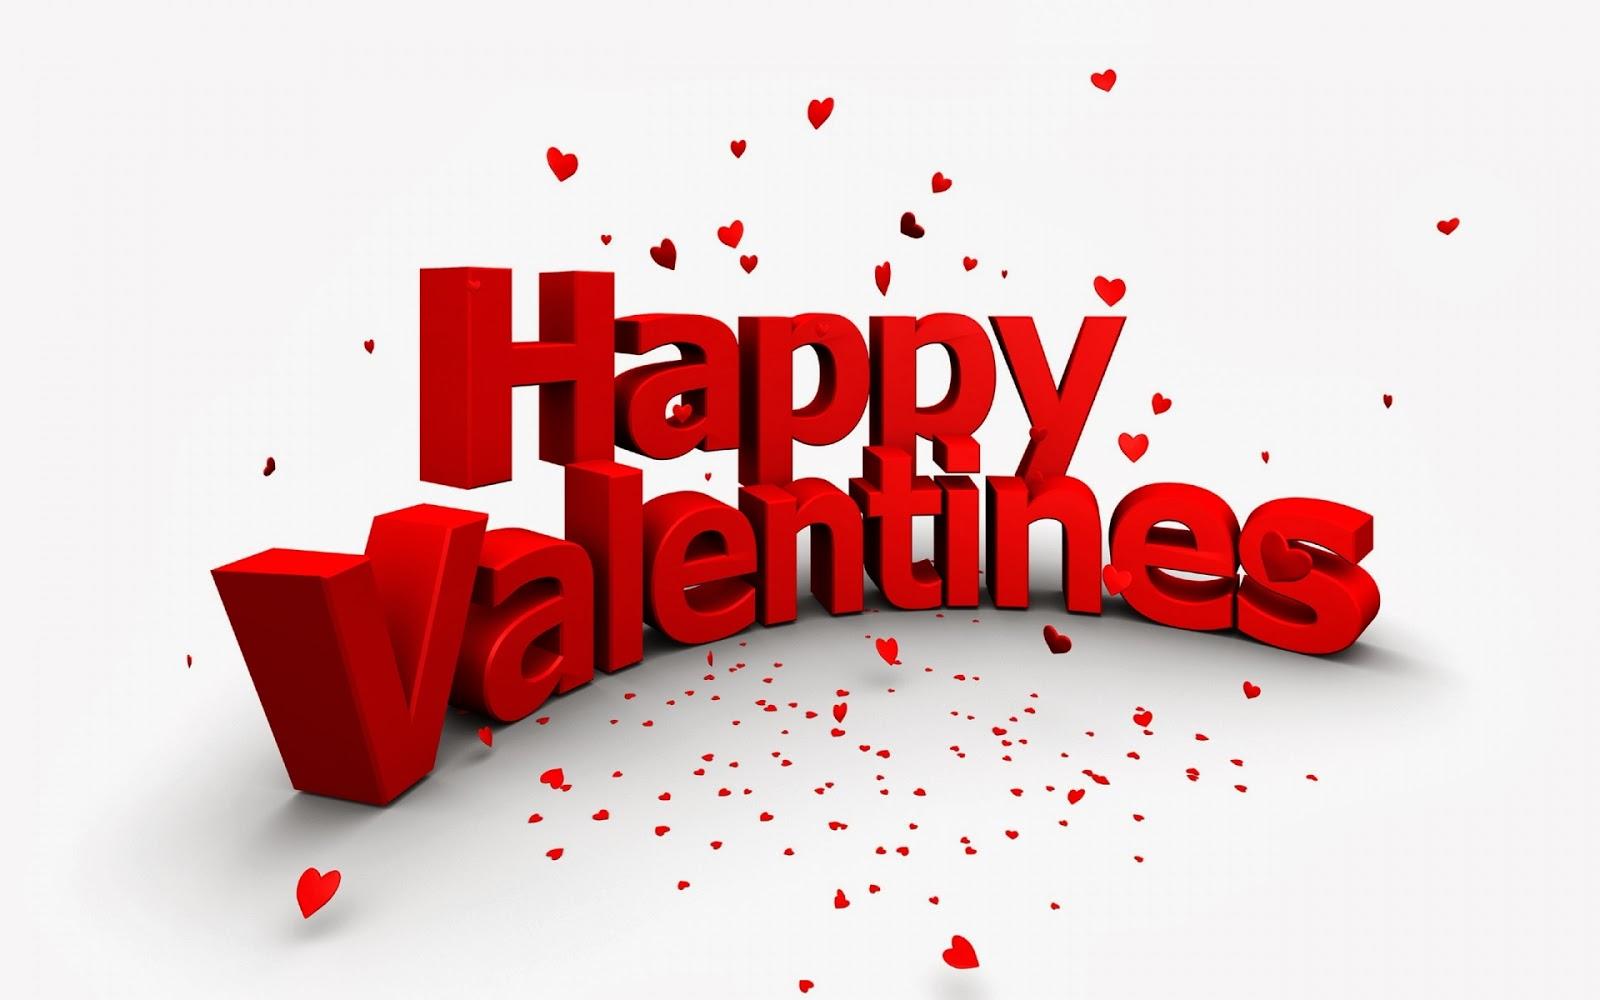 Happy-Valentines-Red-3d-text-white-BG-HD-Desktop-wallpaper.jpg